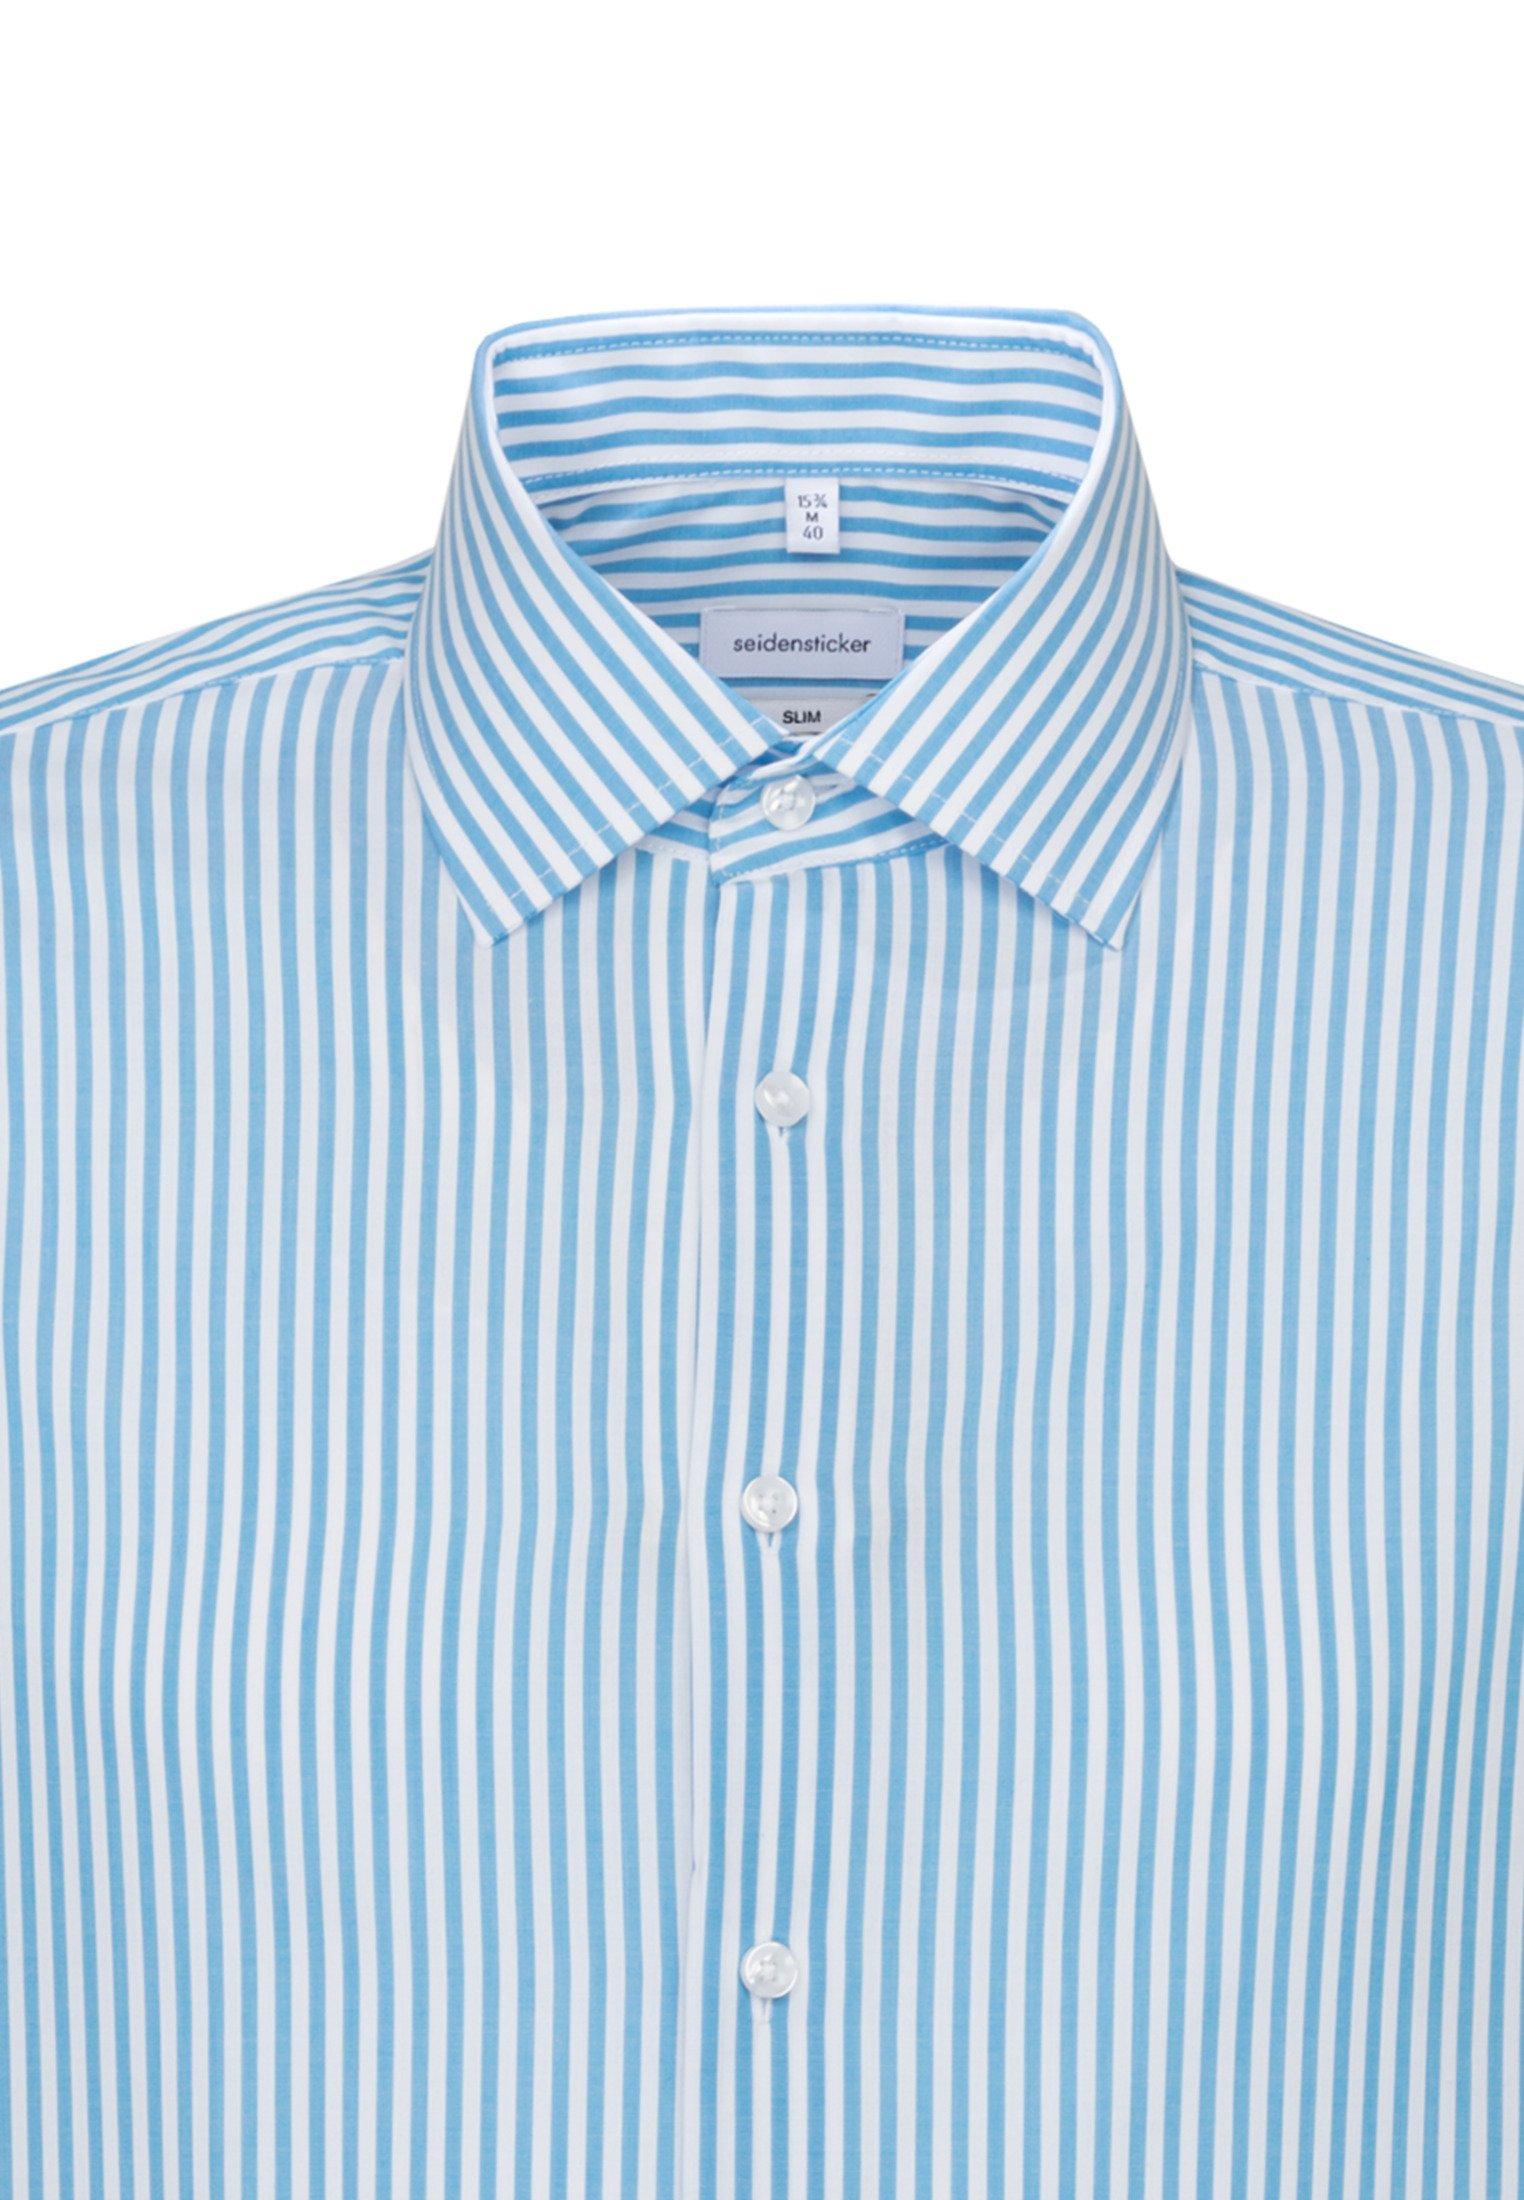 Seidensticker Slim Fit - Overhemd Petrol